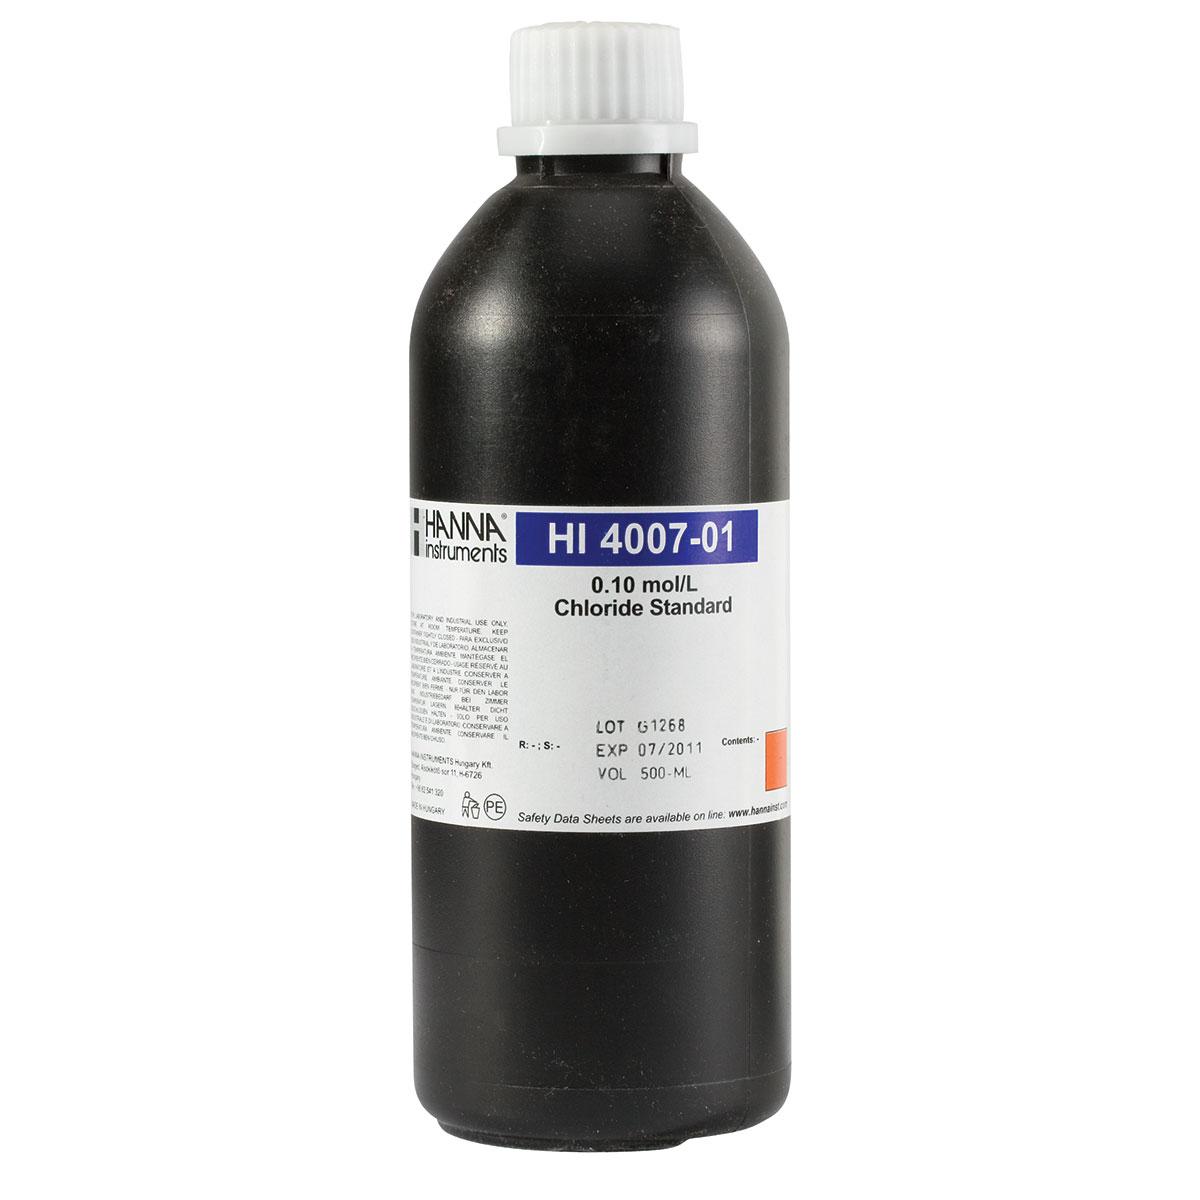 Solución Estándar 0.1M para ISE de Cloruro (500mL) - HI4007-01